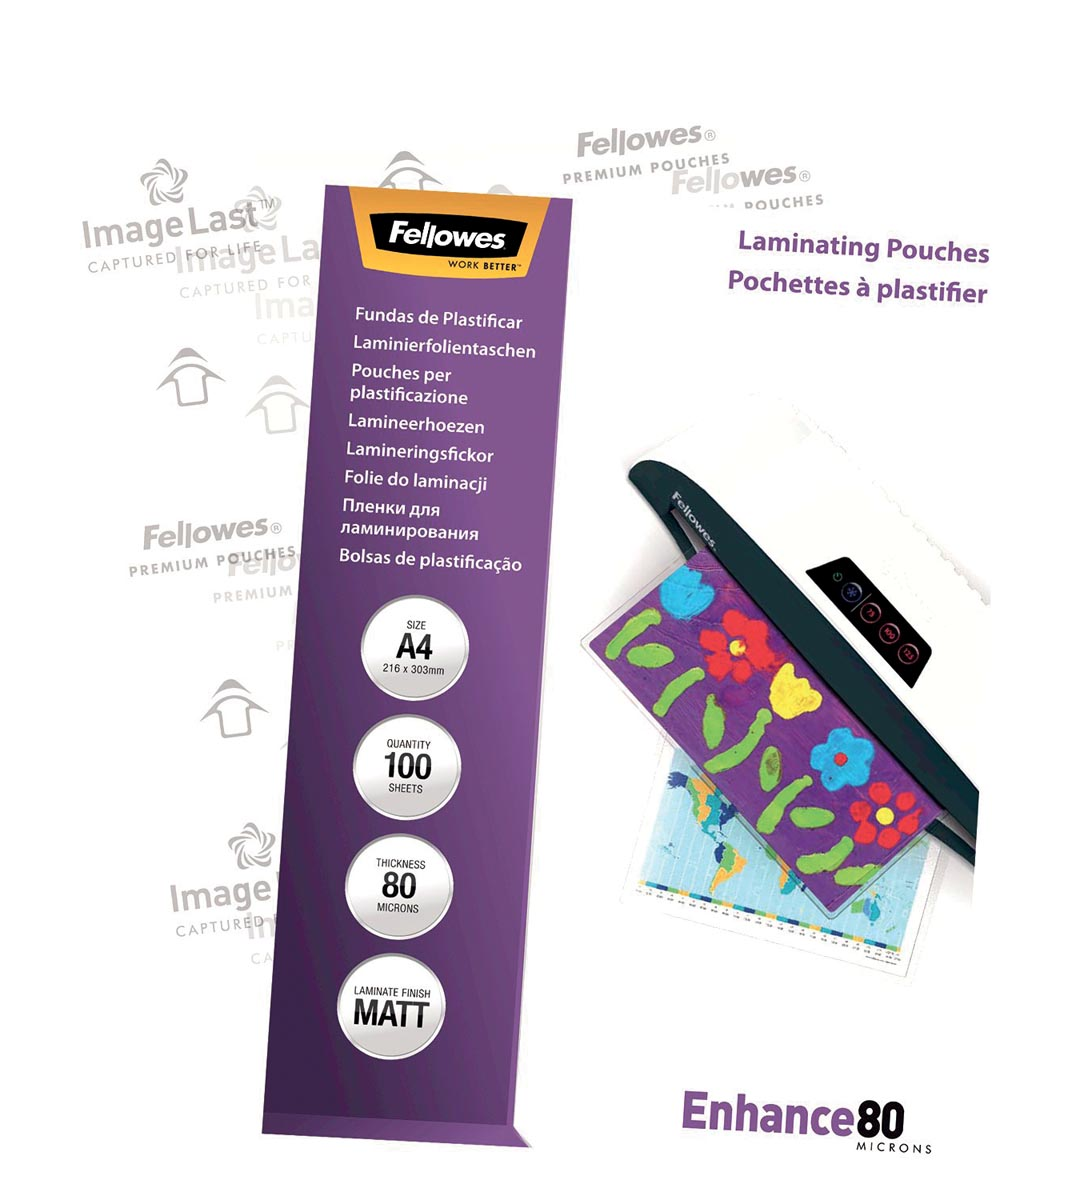 Fellowes lamineerhoes Enhance80 ft A4, 160 micron (2 x 80 micron), pak van 100 stuks, mat